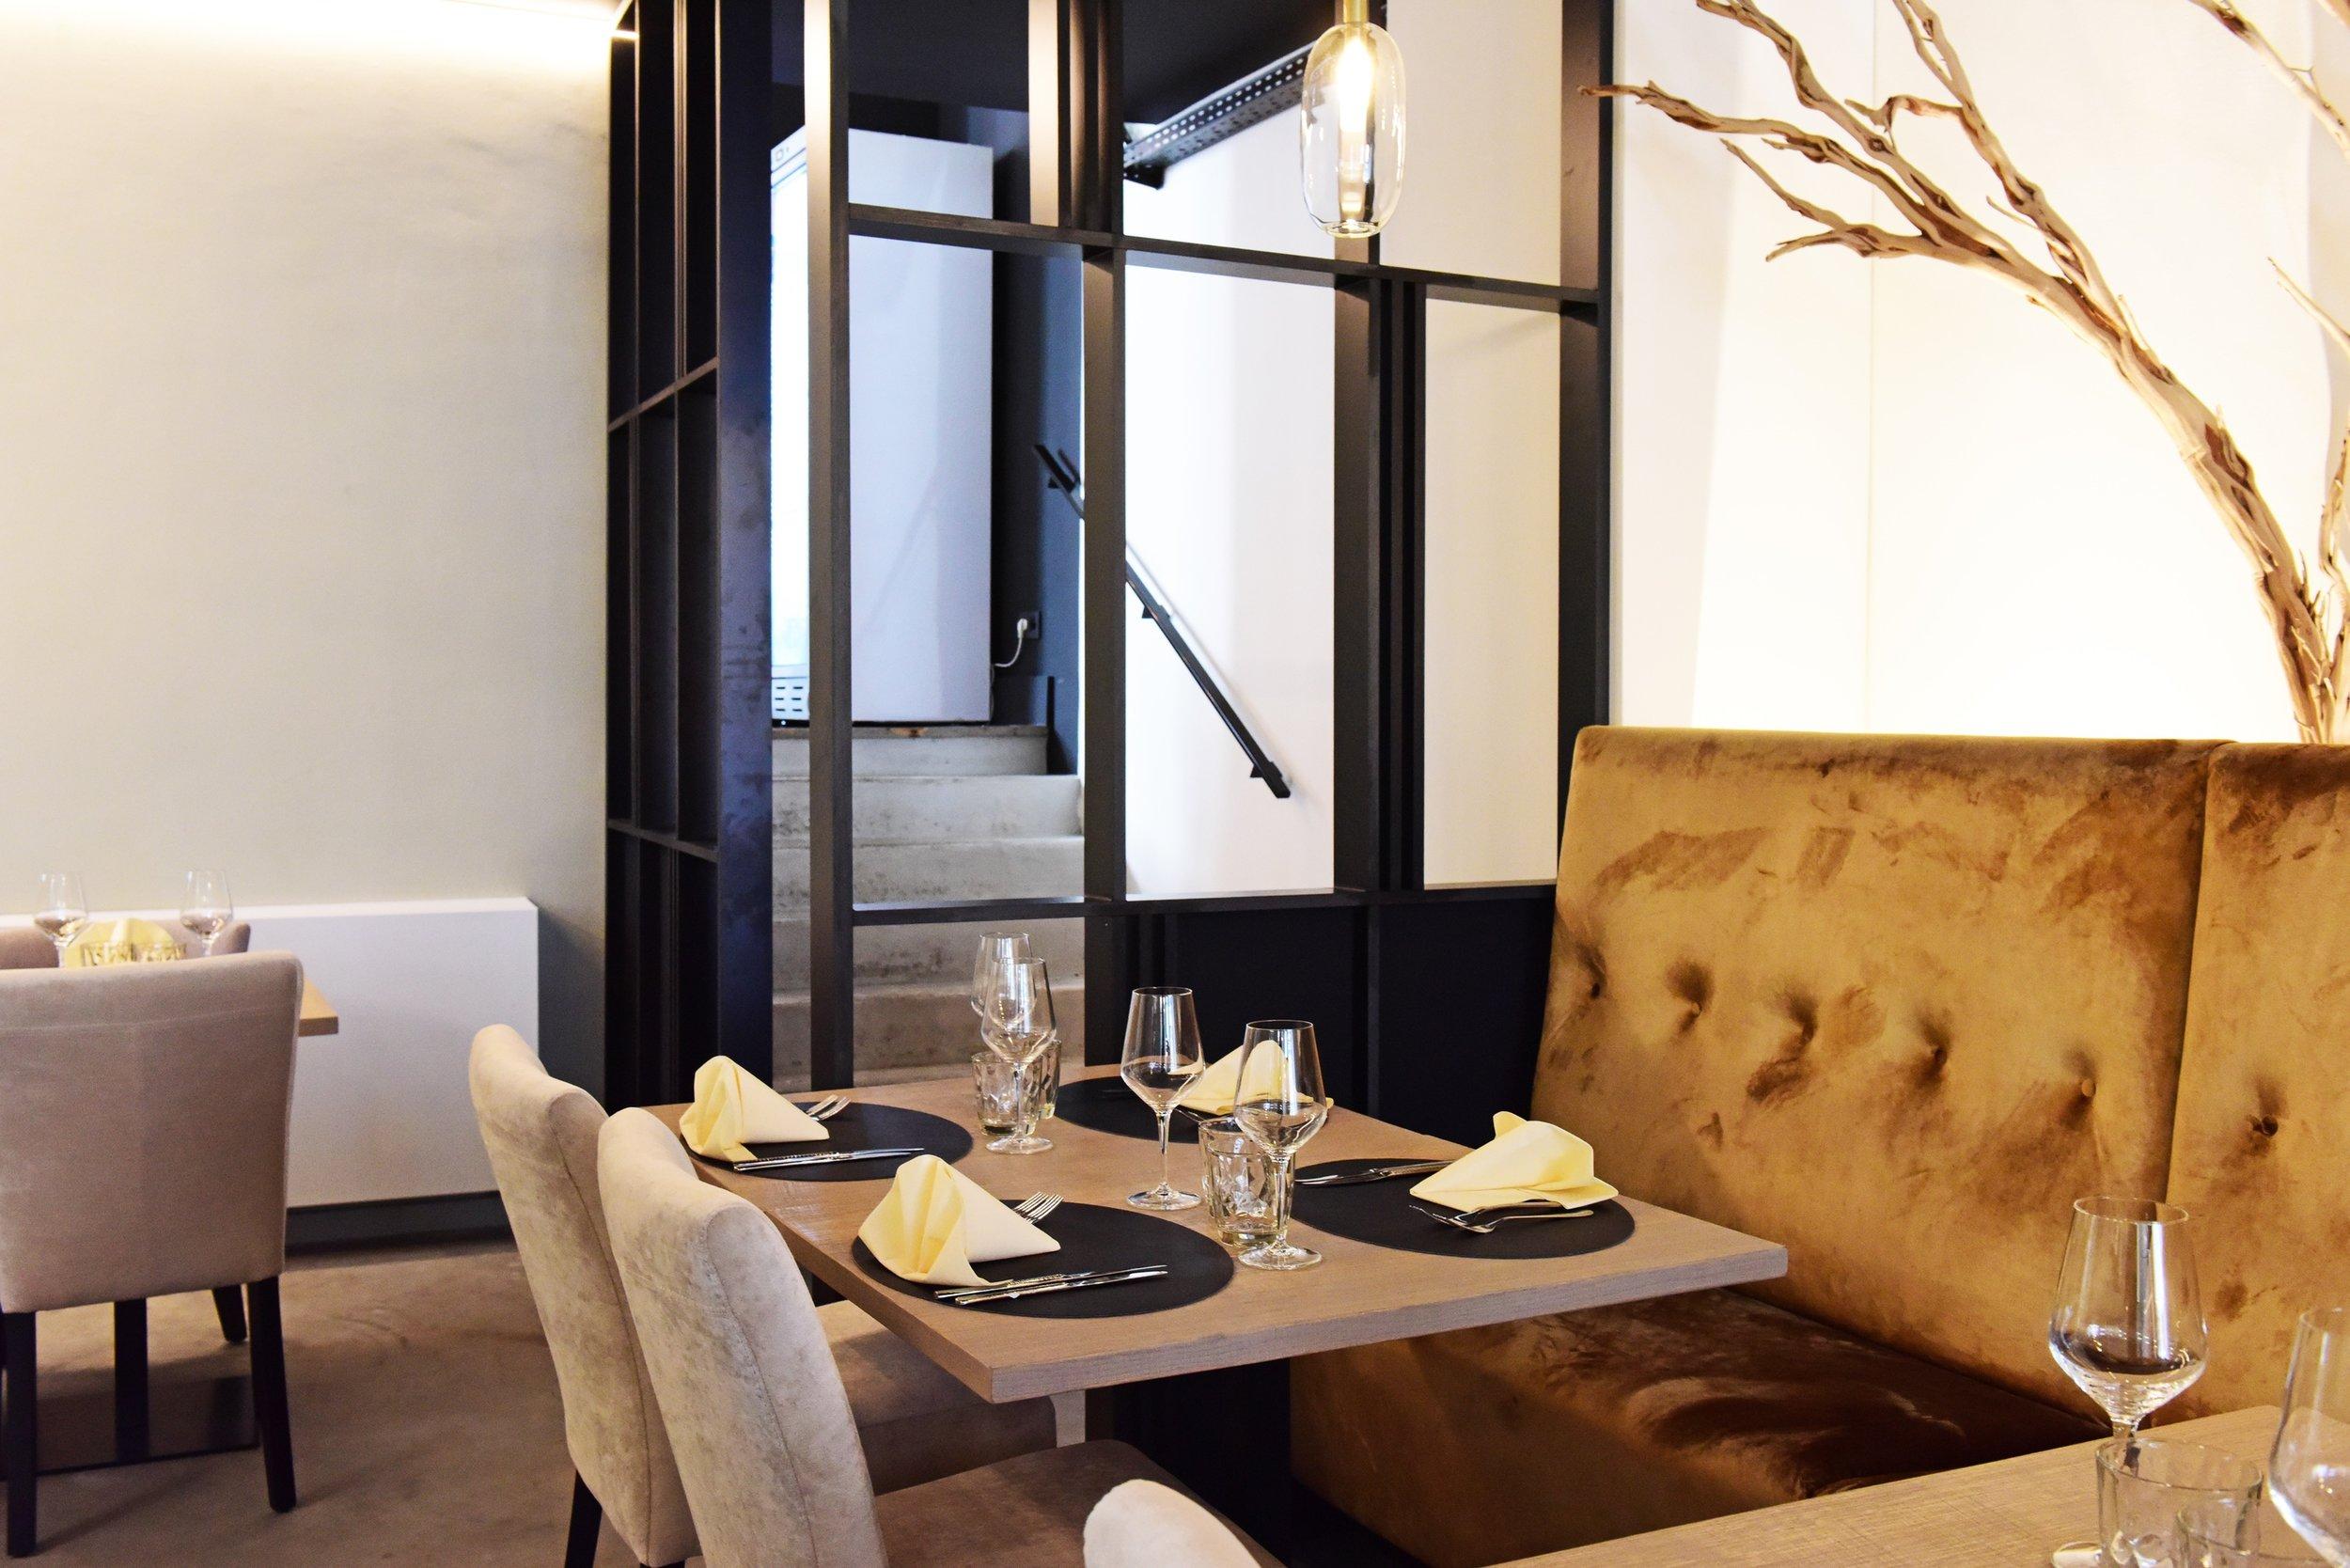 17 italiaans restaurant gent l incontro lincontro.jpg.jpg.jpg.jpg.jpg.jpg